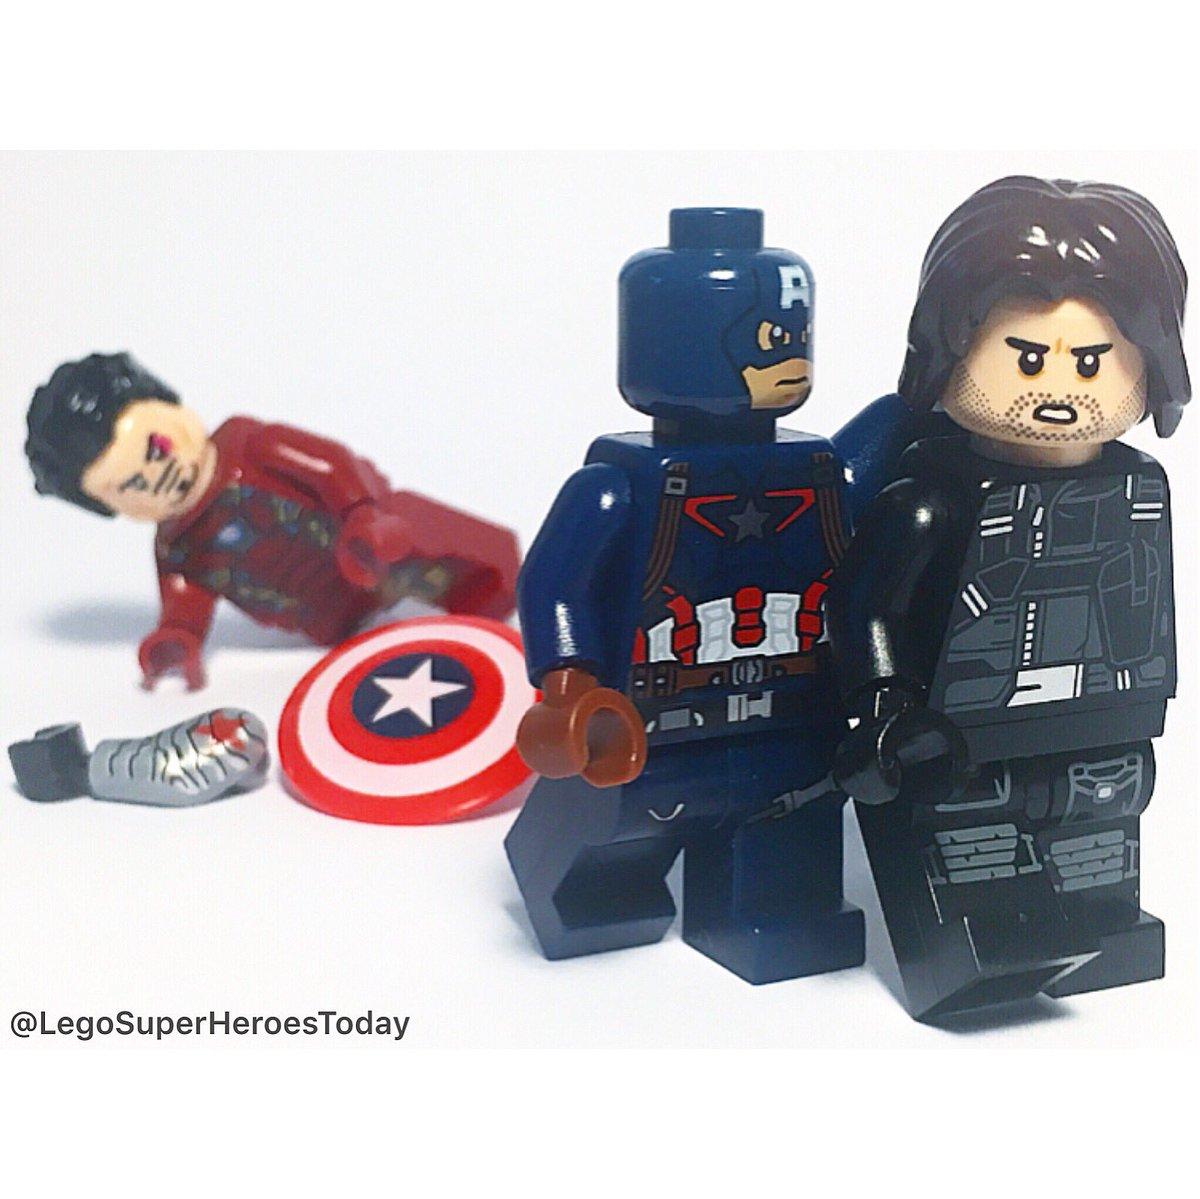 &quot;That shield doesn&#39;t belong to you...&quot;  #lego #marvel #mcu #captainamerica #buckybarnes #wintersoldier #sebastianstan #chrisevans #ironman<br>http://pic.twitter.com/rdeI6D4fOX